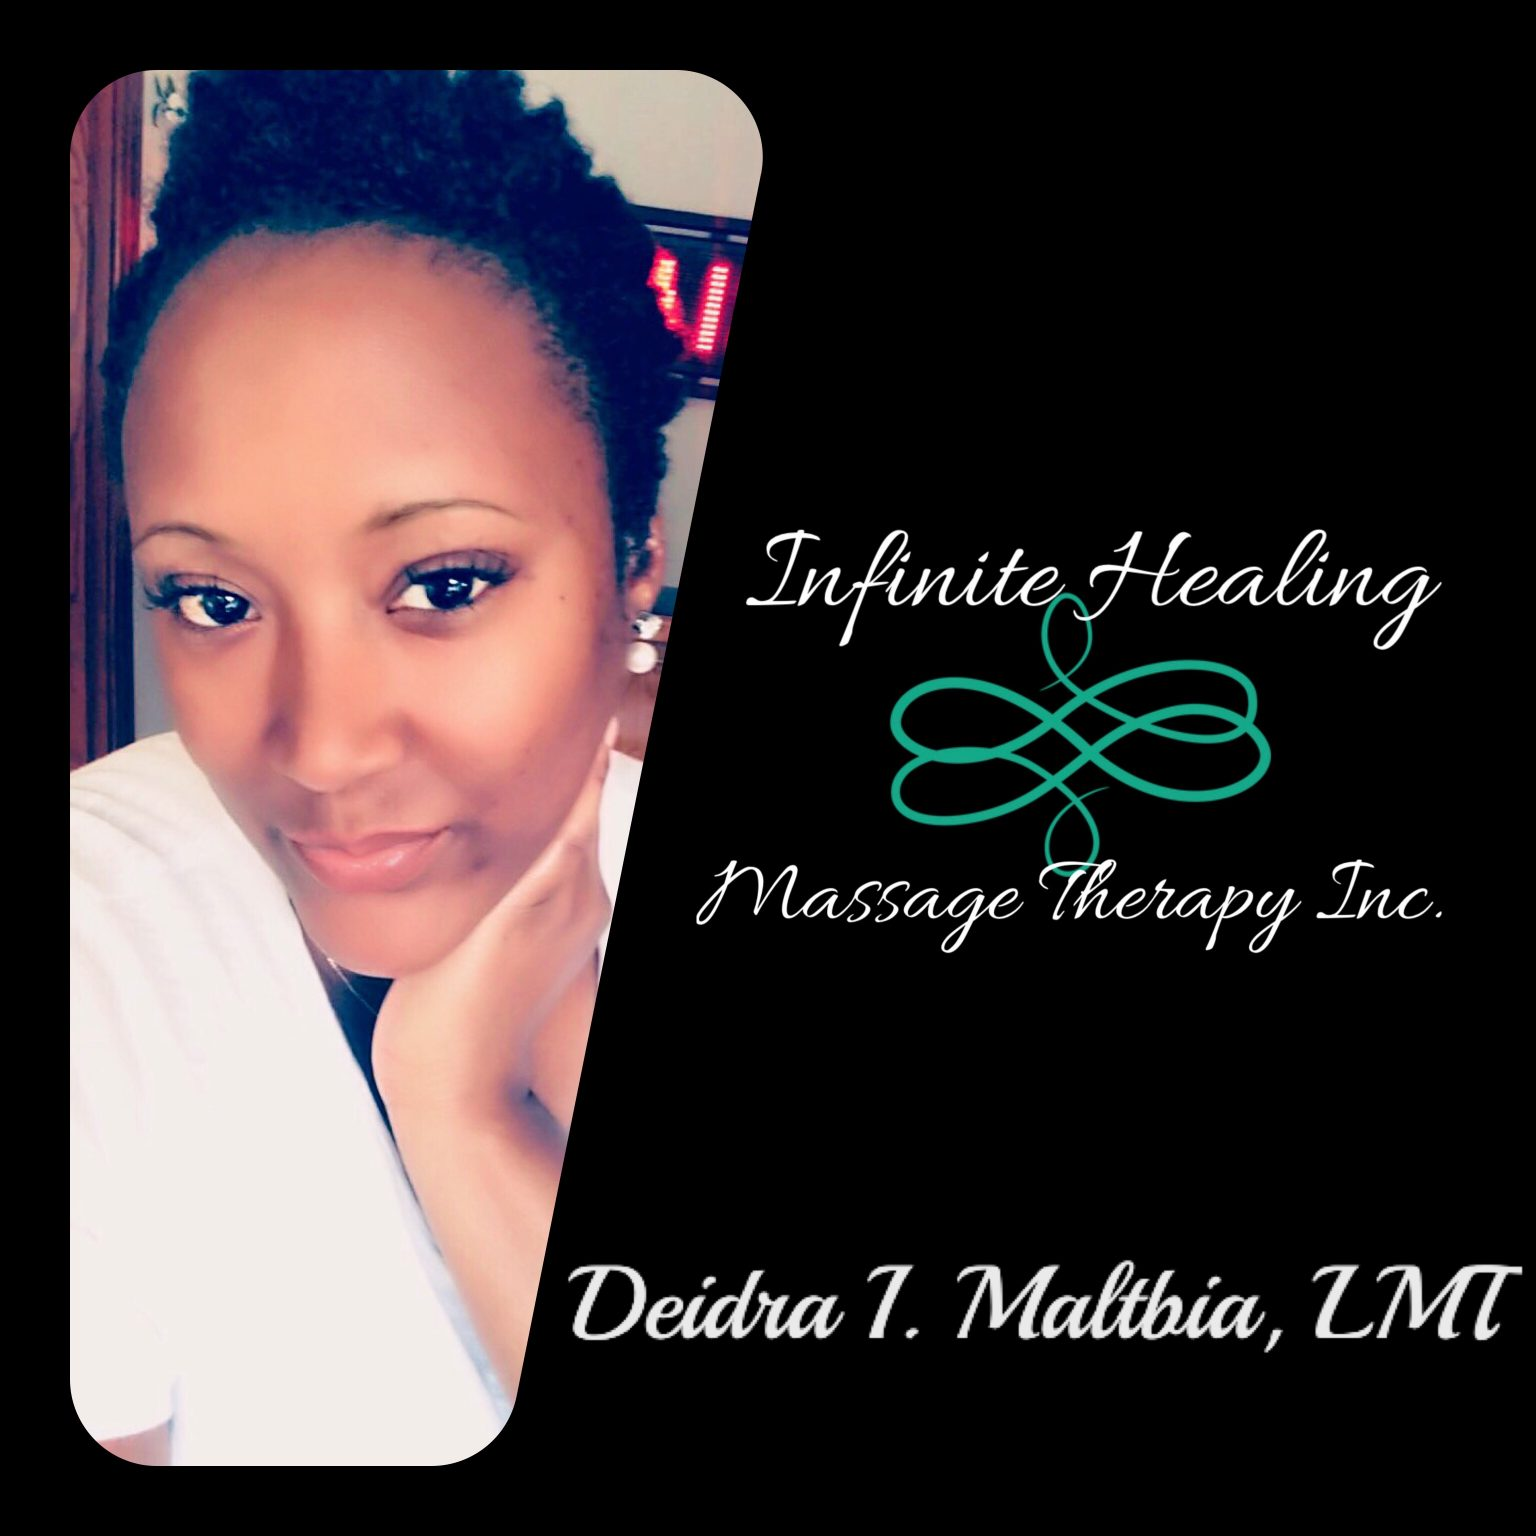 Infinite Healing Massage Therapy